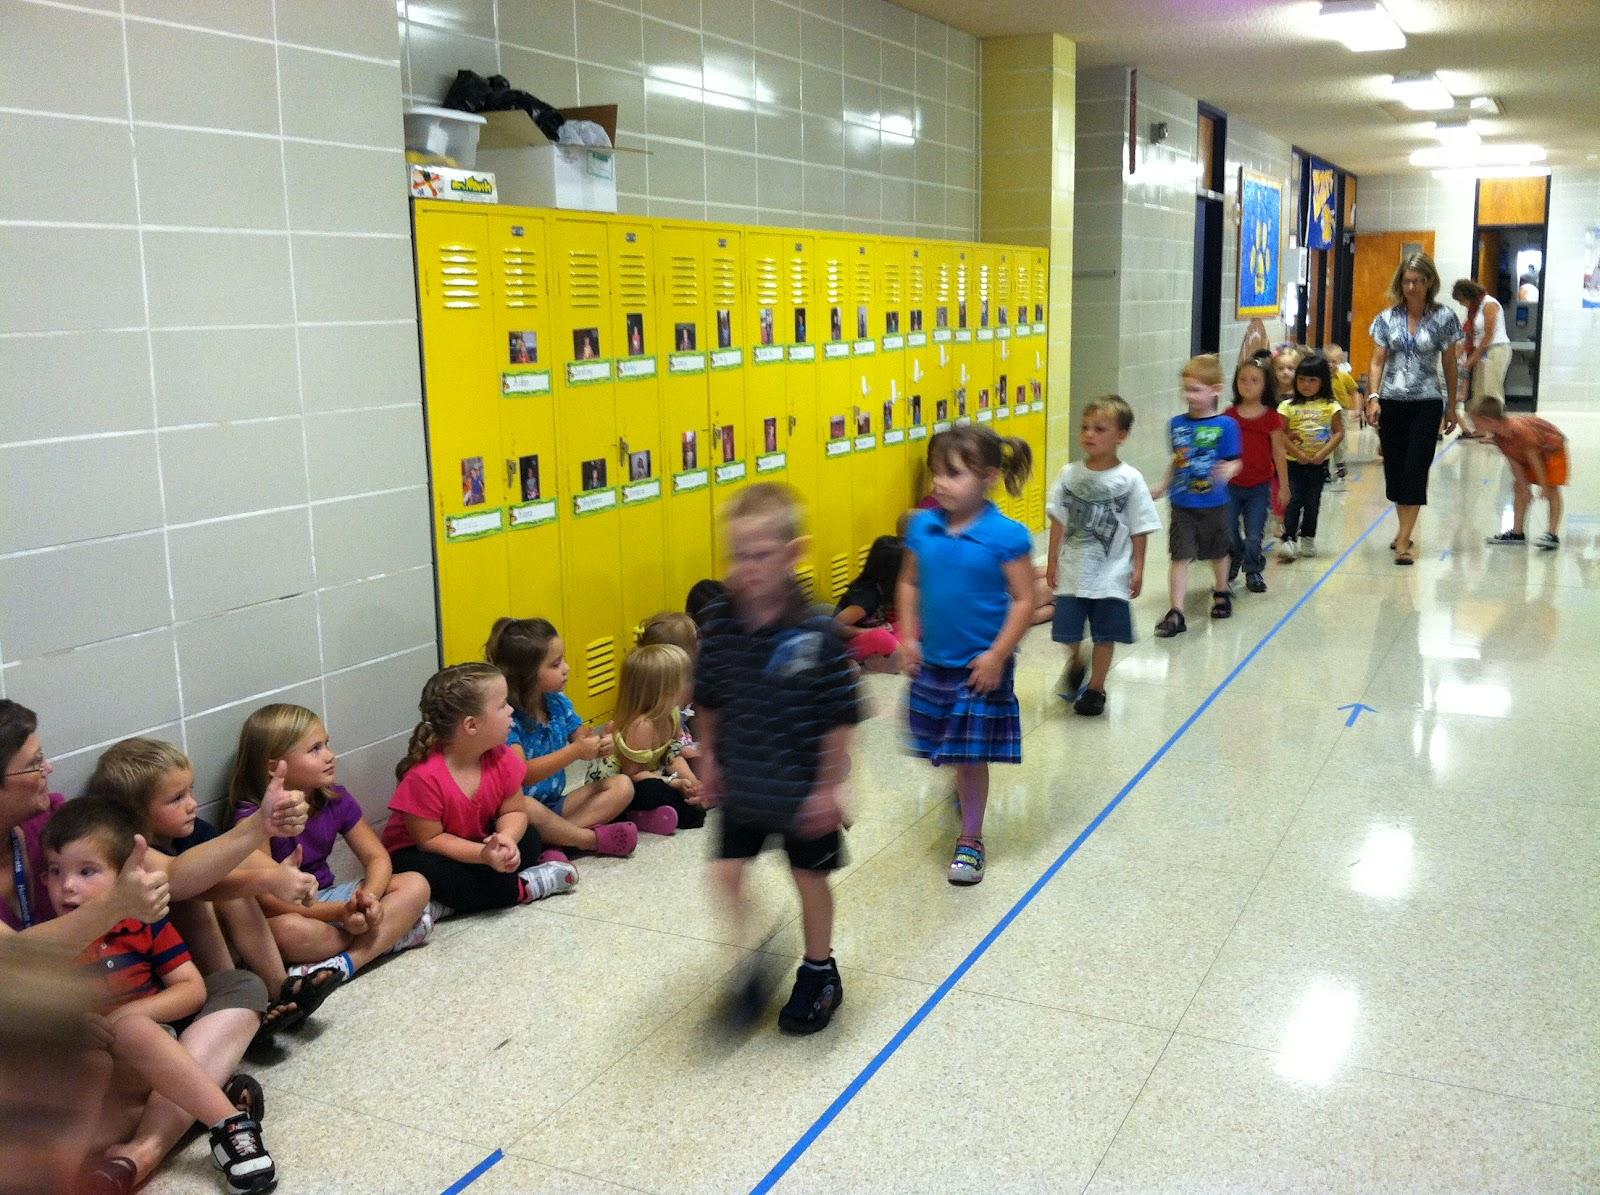 School Board of Broward County  NOB HILL ELEMENTARY SCHOOL RENOVATIONS